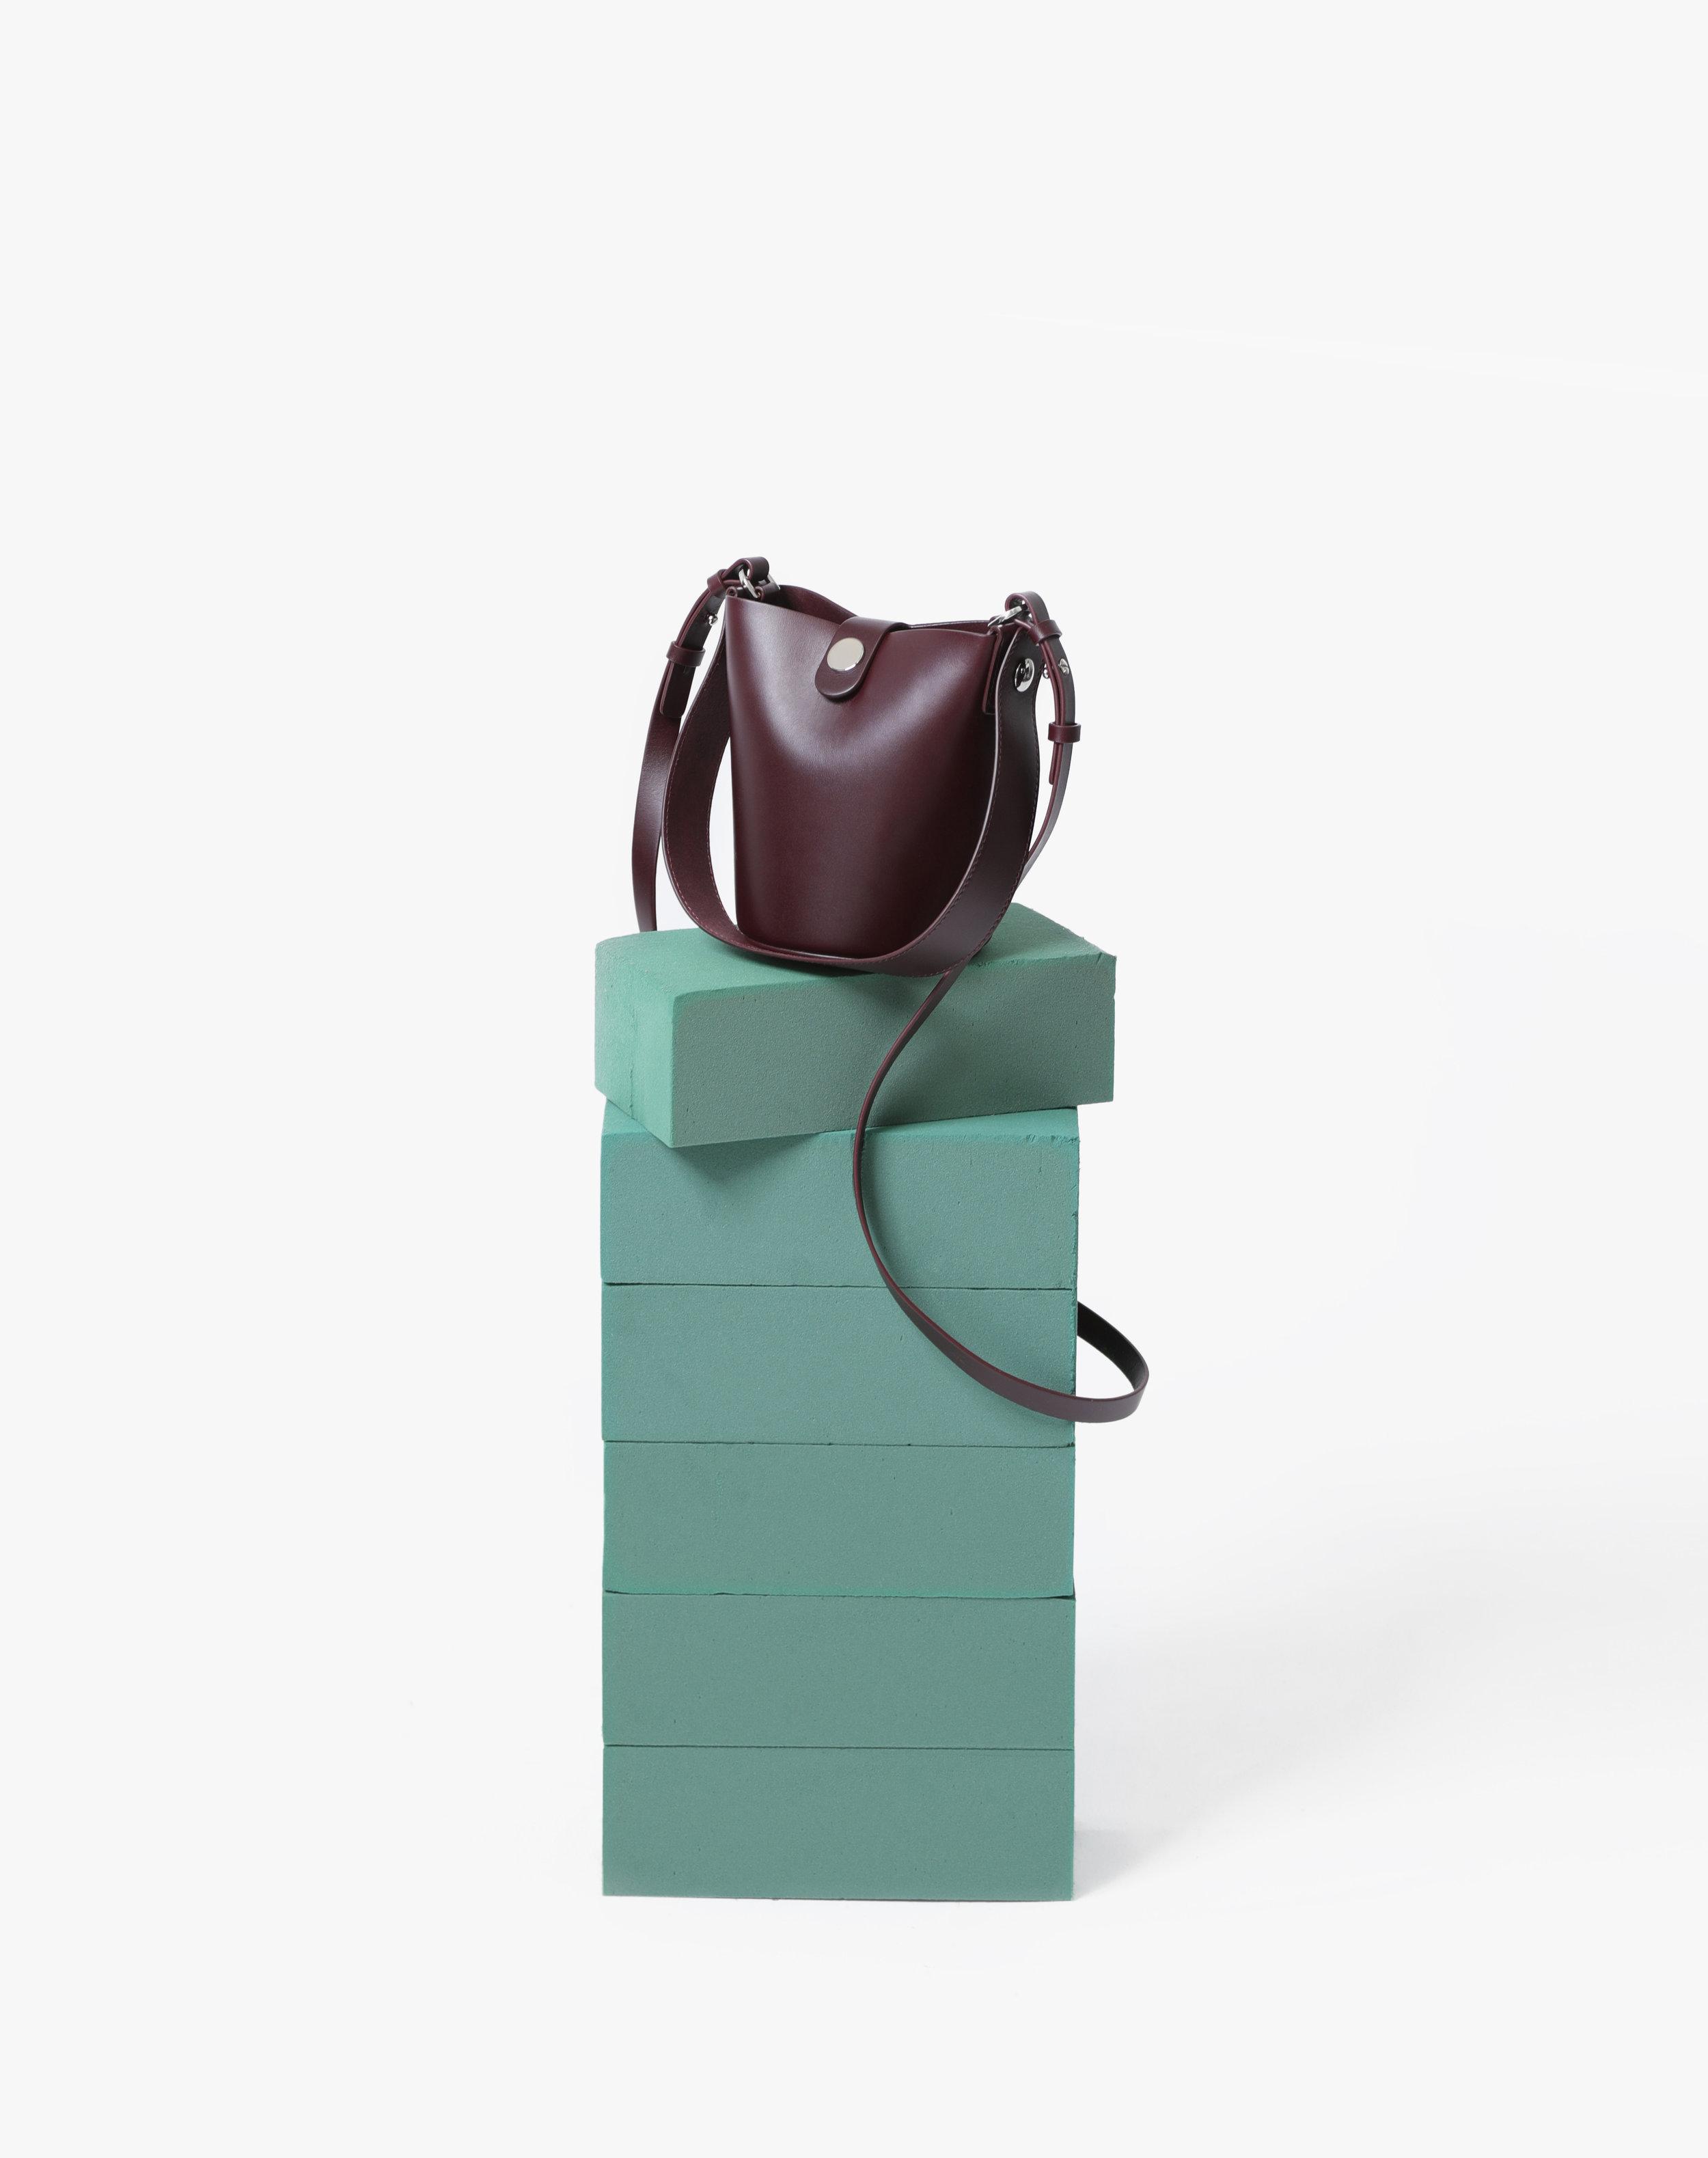 handbag on plinth